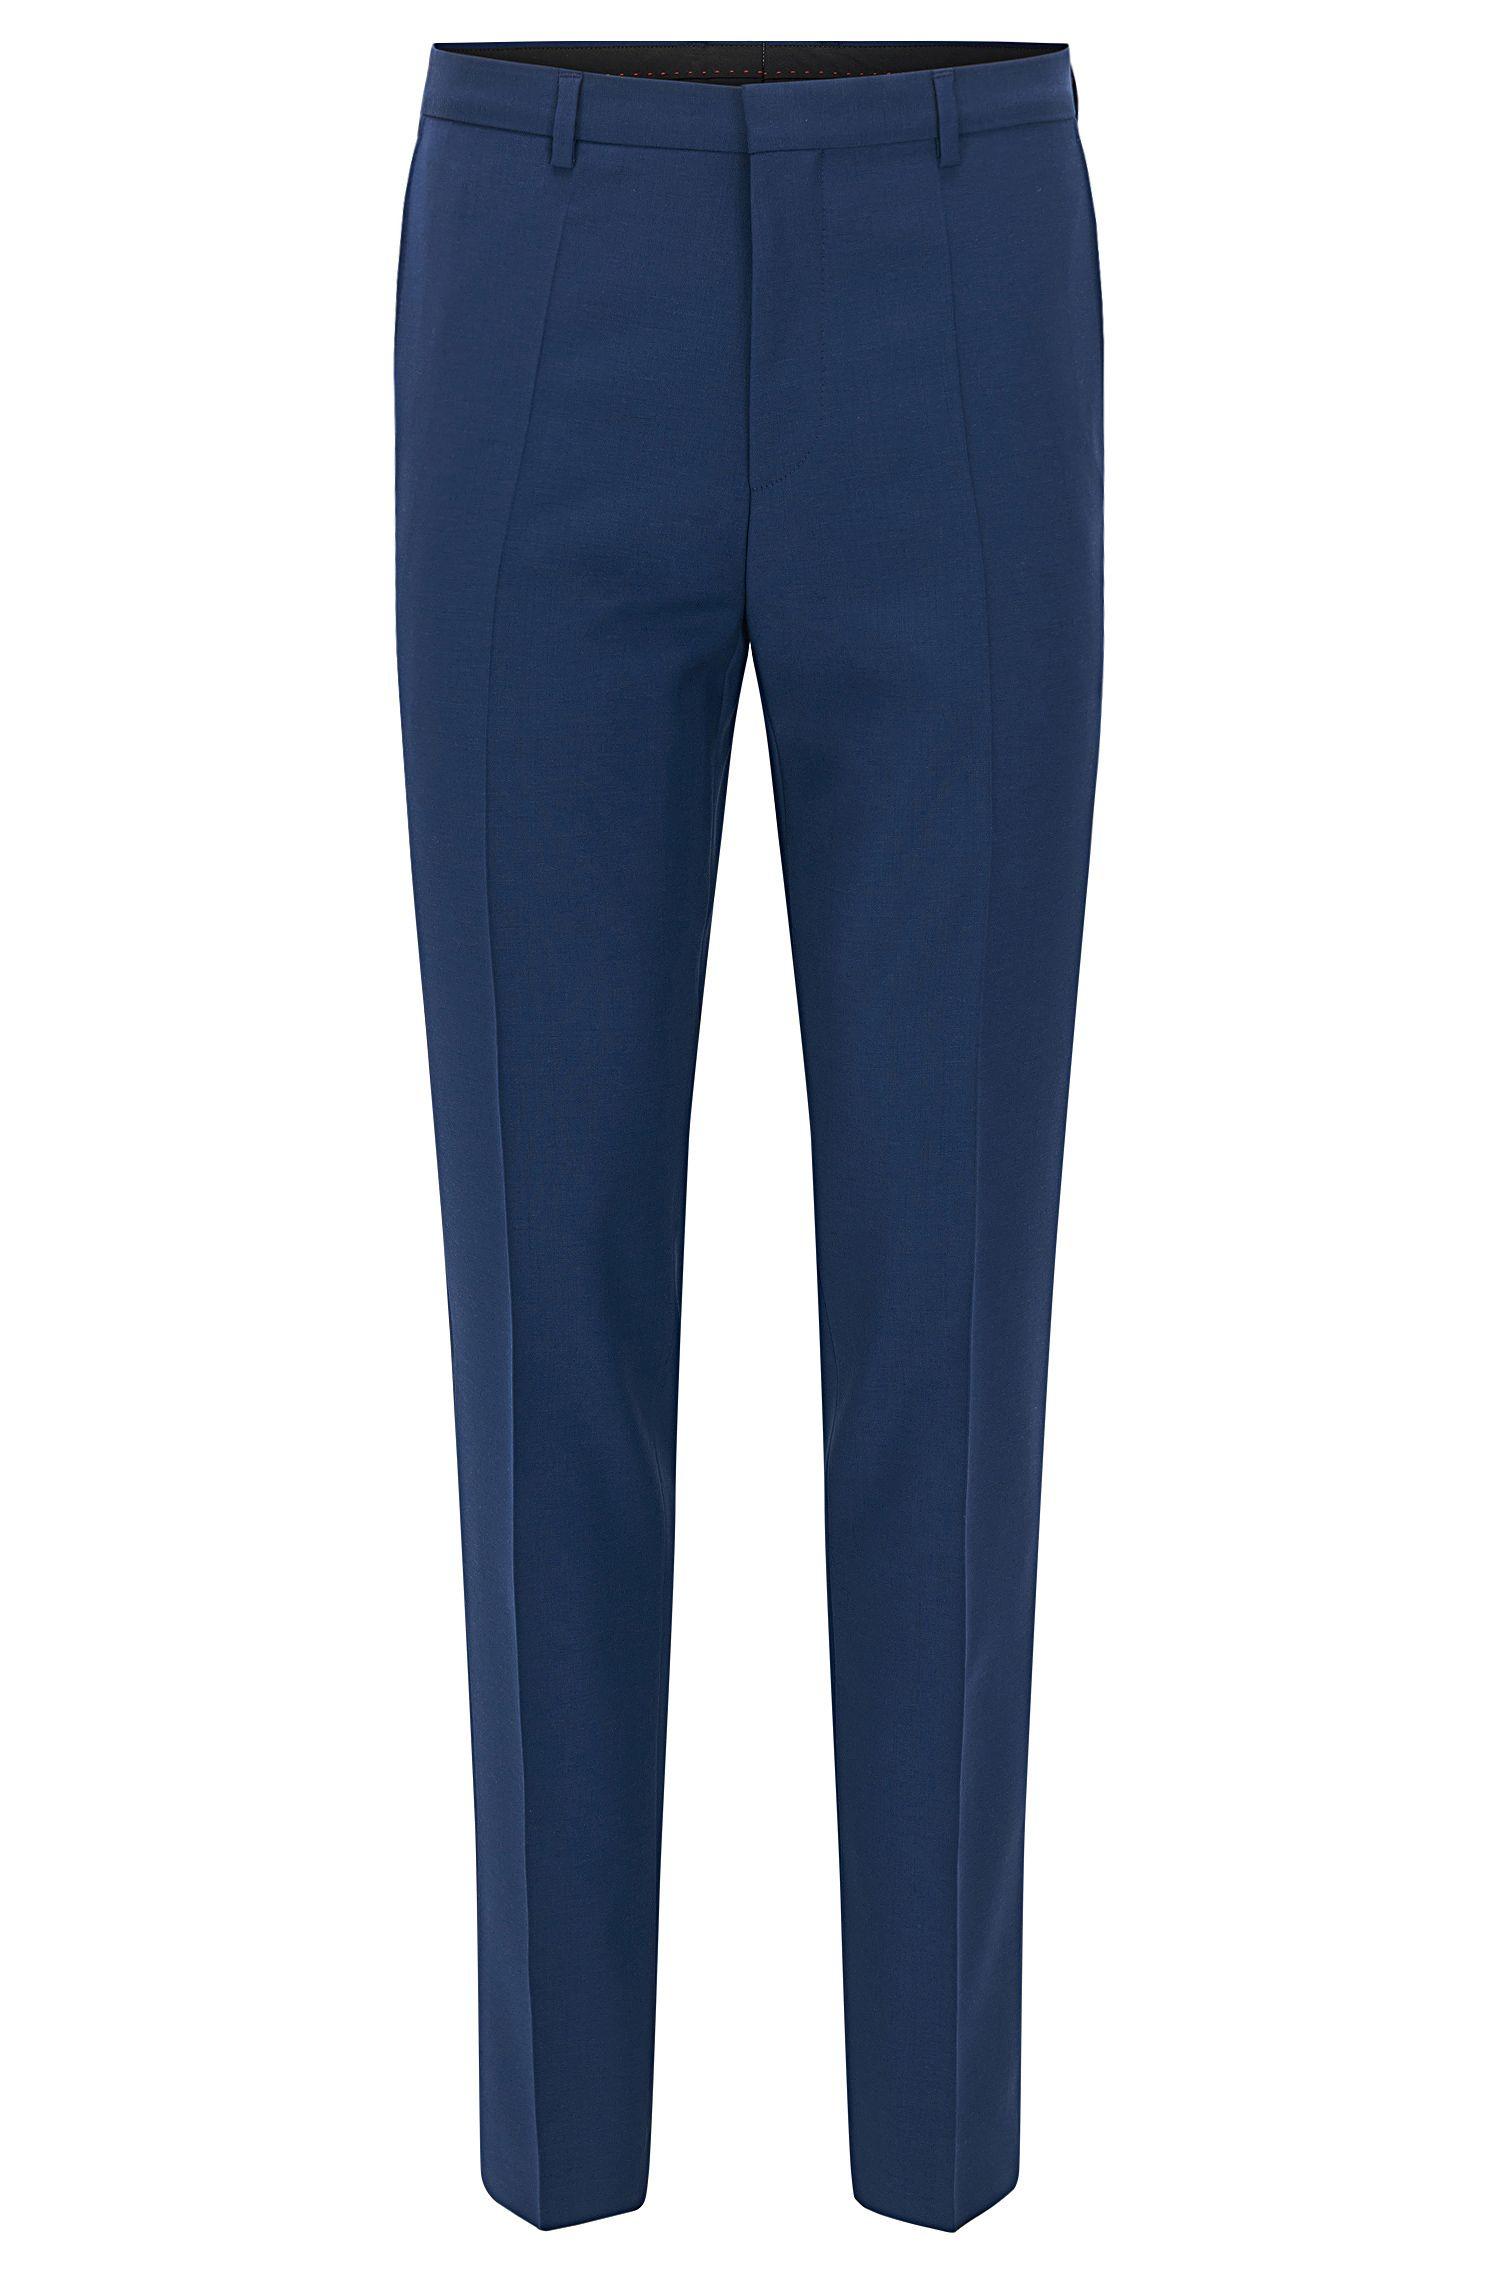 Pantalon HUGO Homme Extra Slim Fit en laine vierge, Bleu